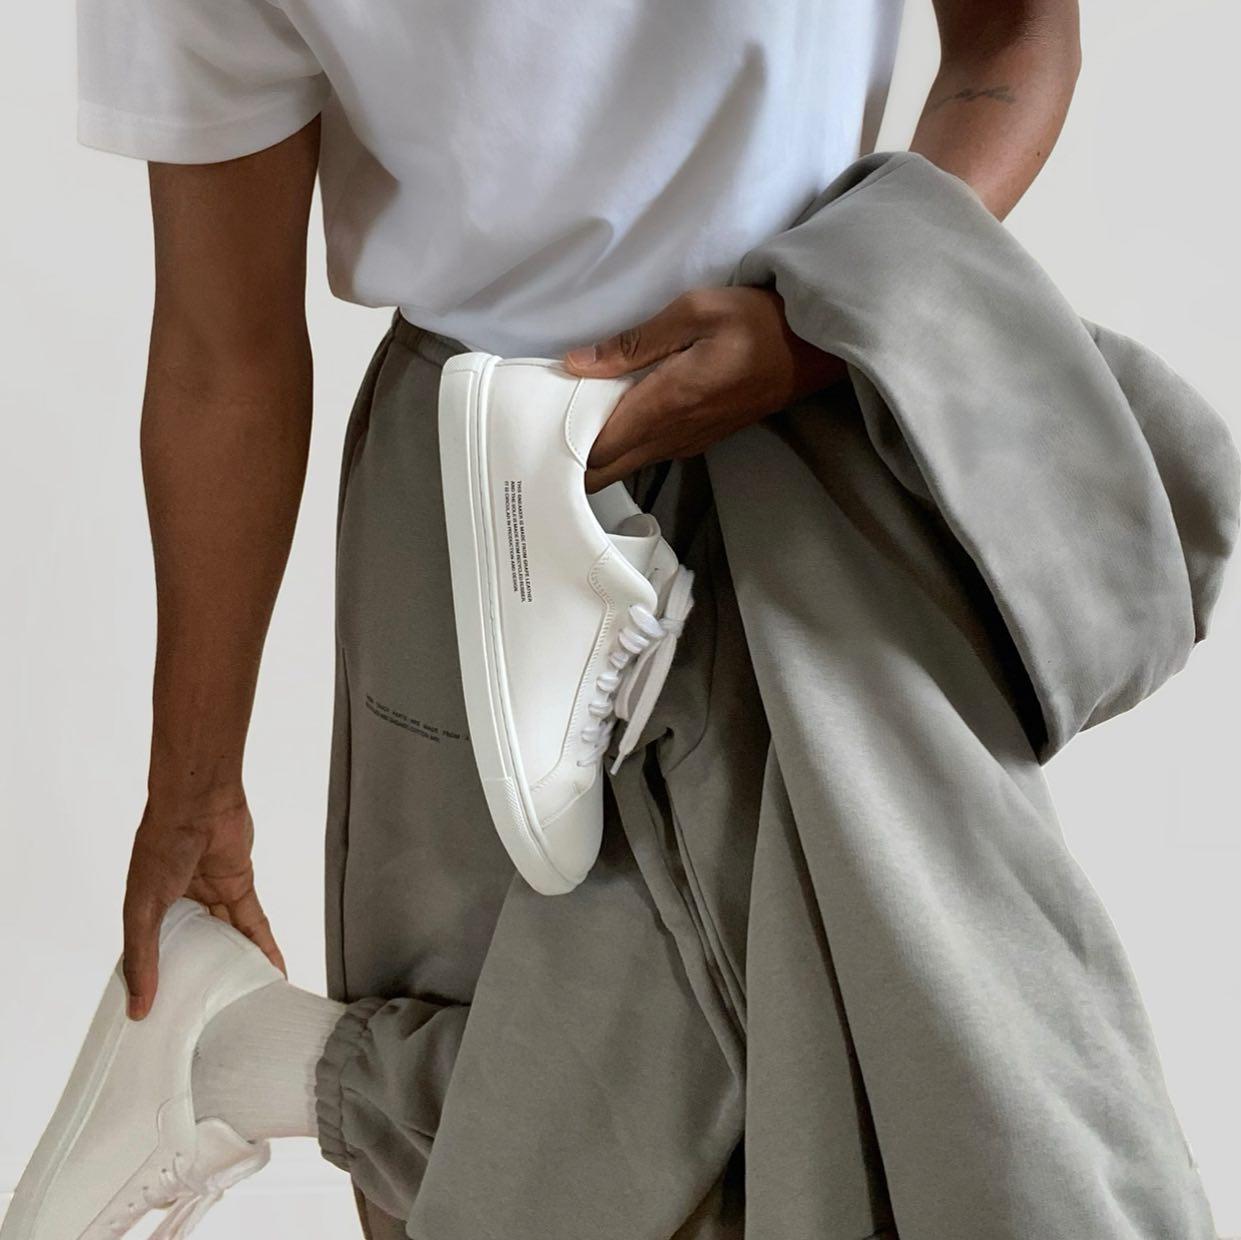 Pangaia, joggers, jogging pants, pandemic trend